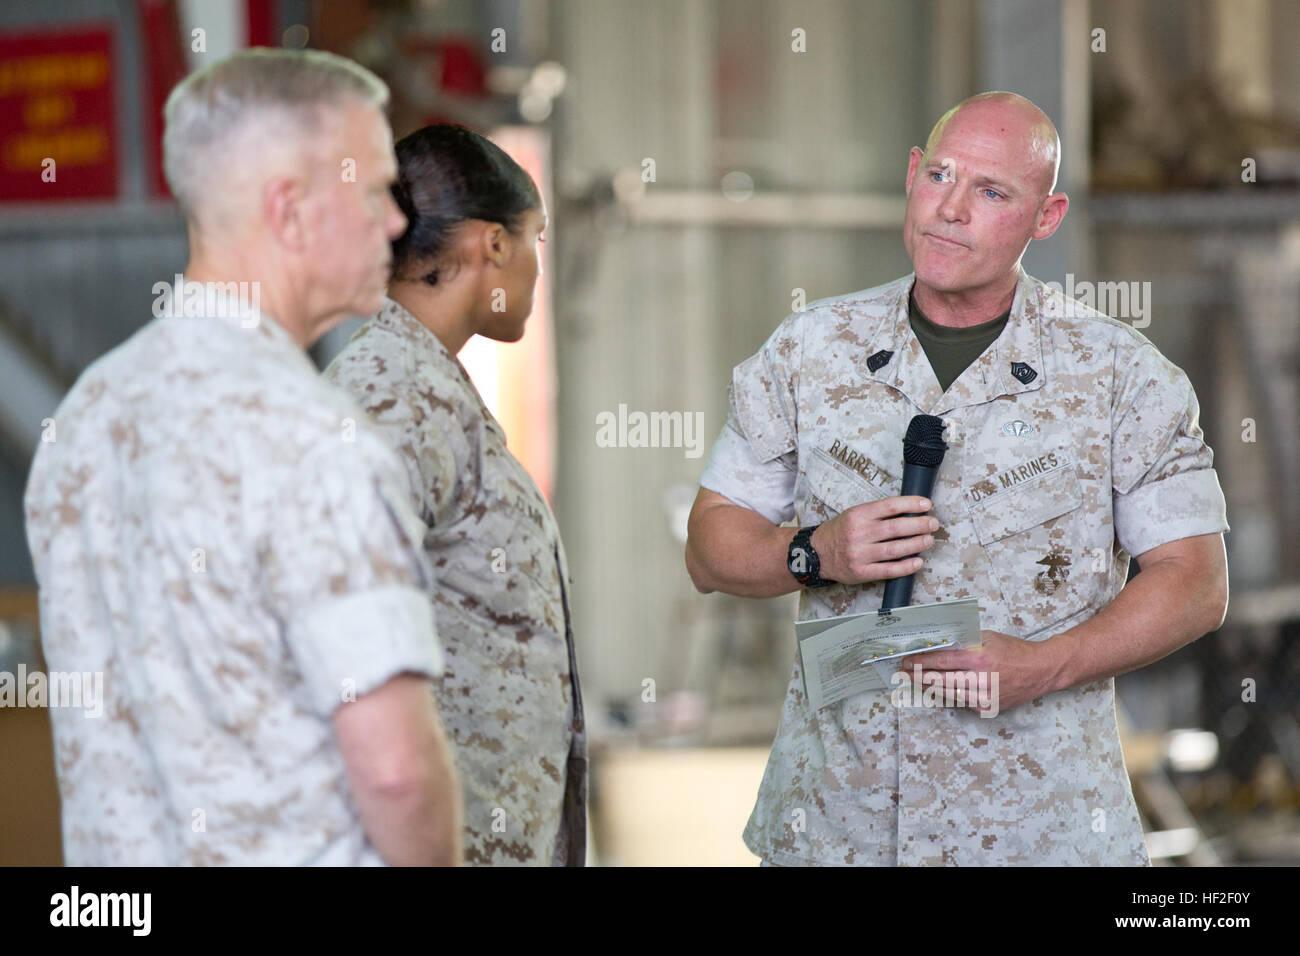 Sergeant Major of the Marine Corps, Sgt. Maj. Micheal P. Barrett, right, talks to Sgt. Malachijah M. Clark, center, Stock Photo